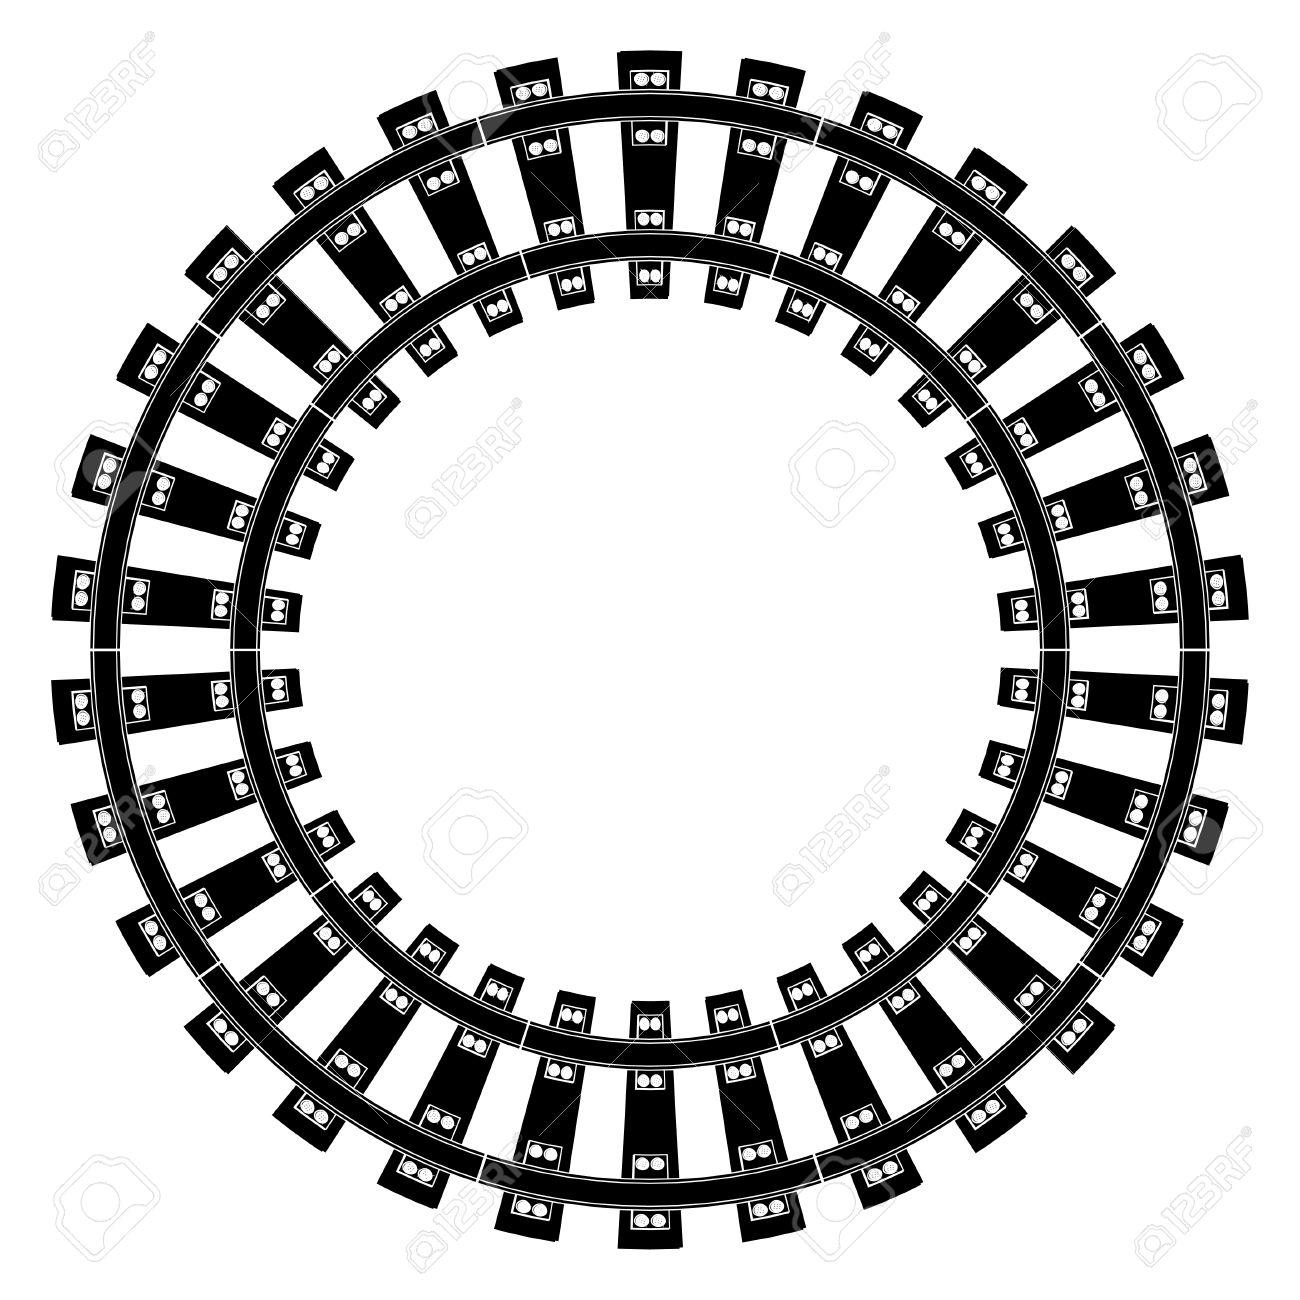 Railway Track Vector